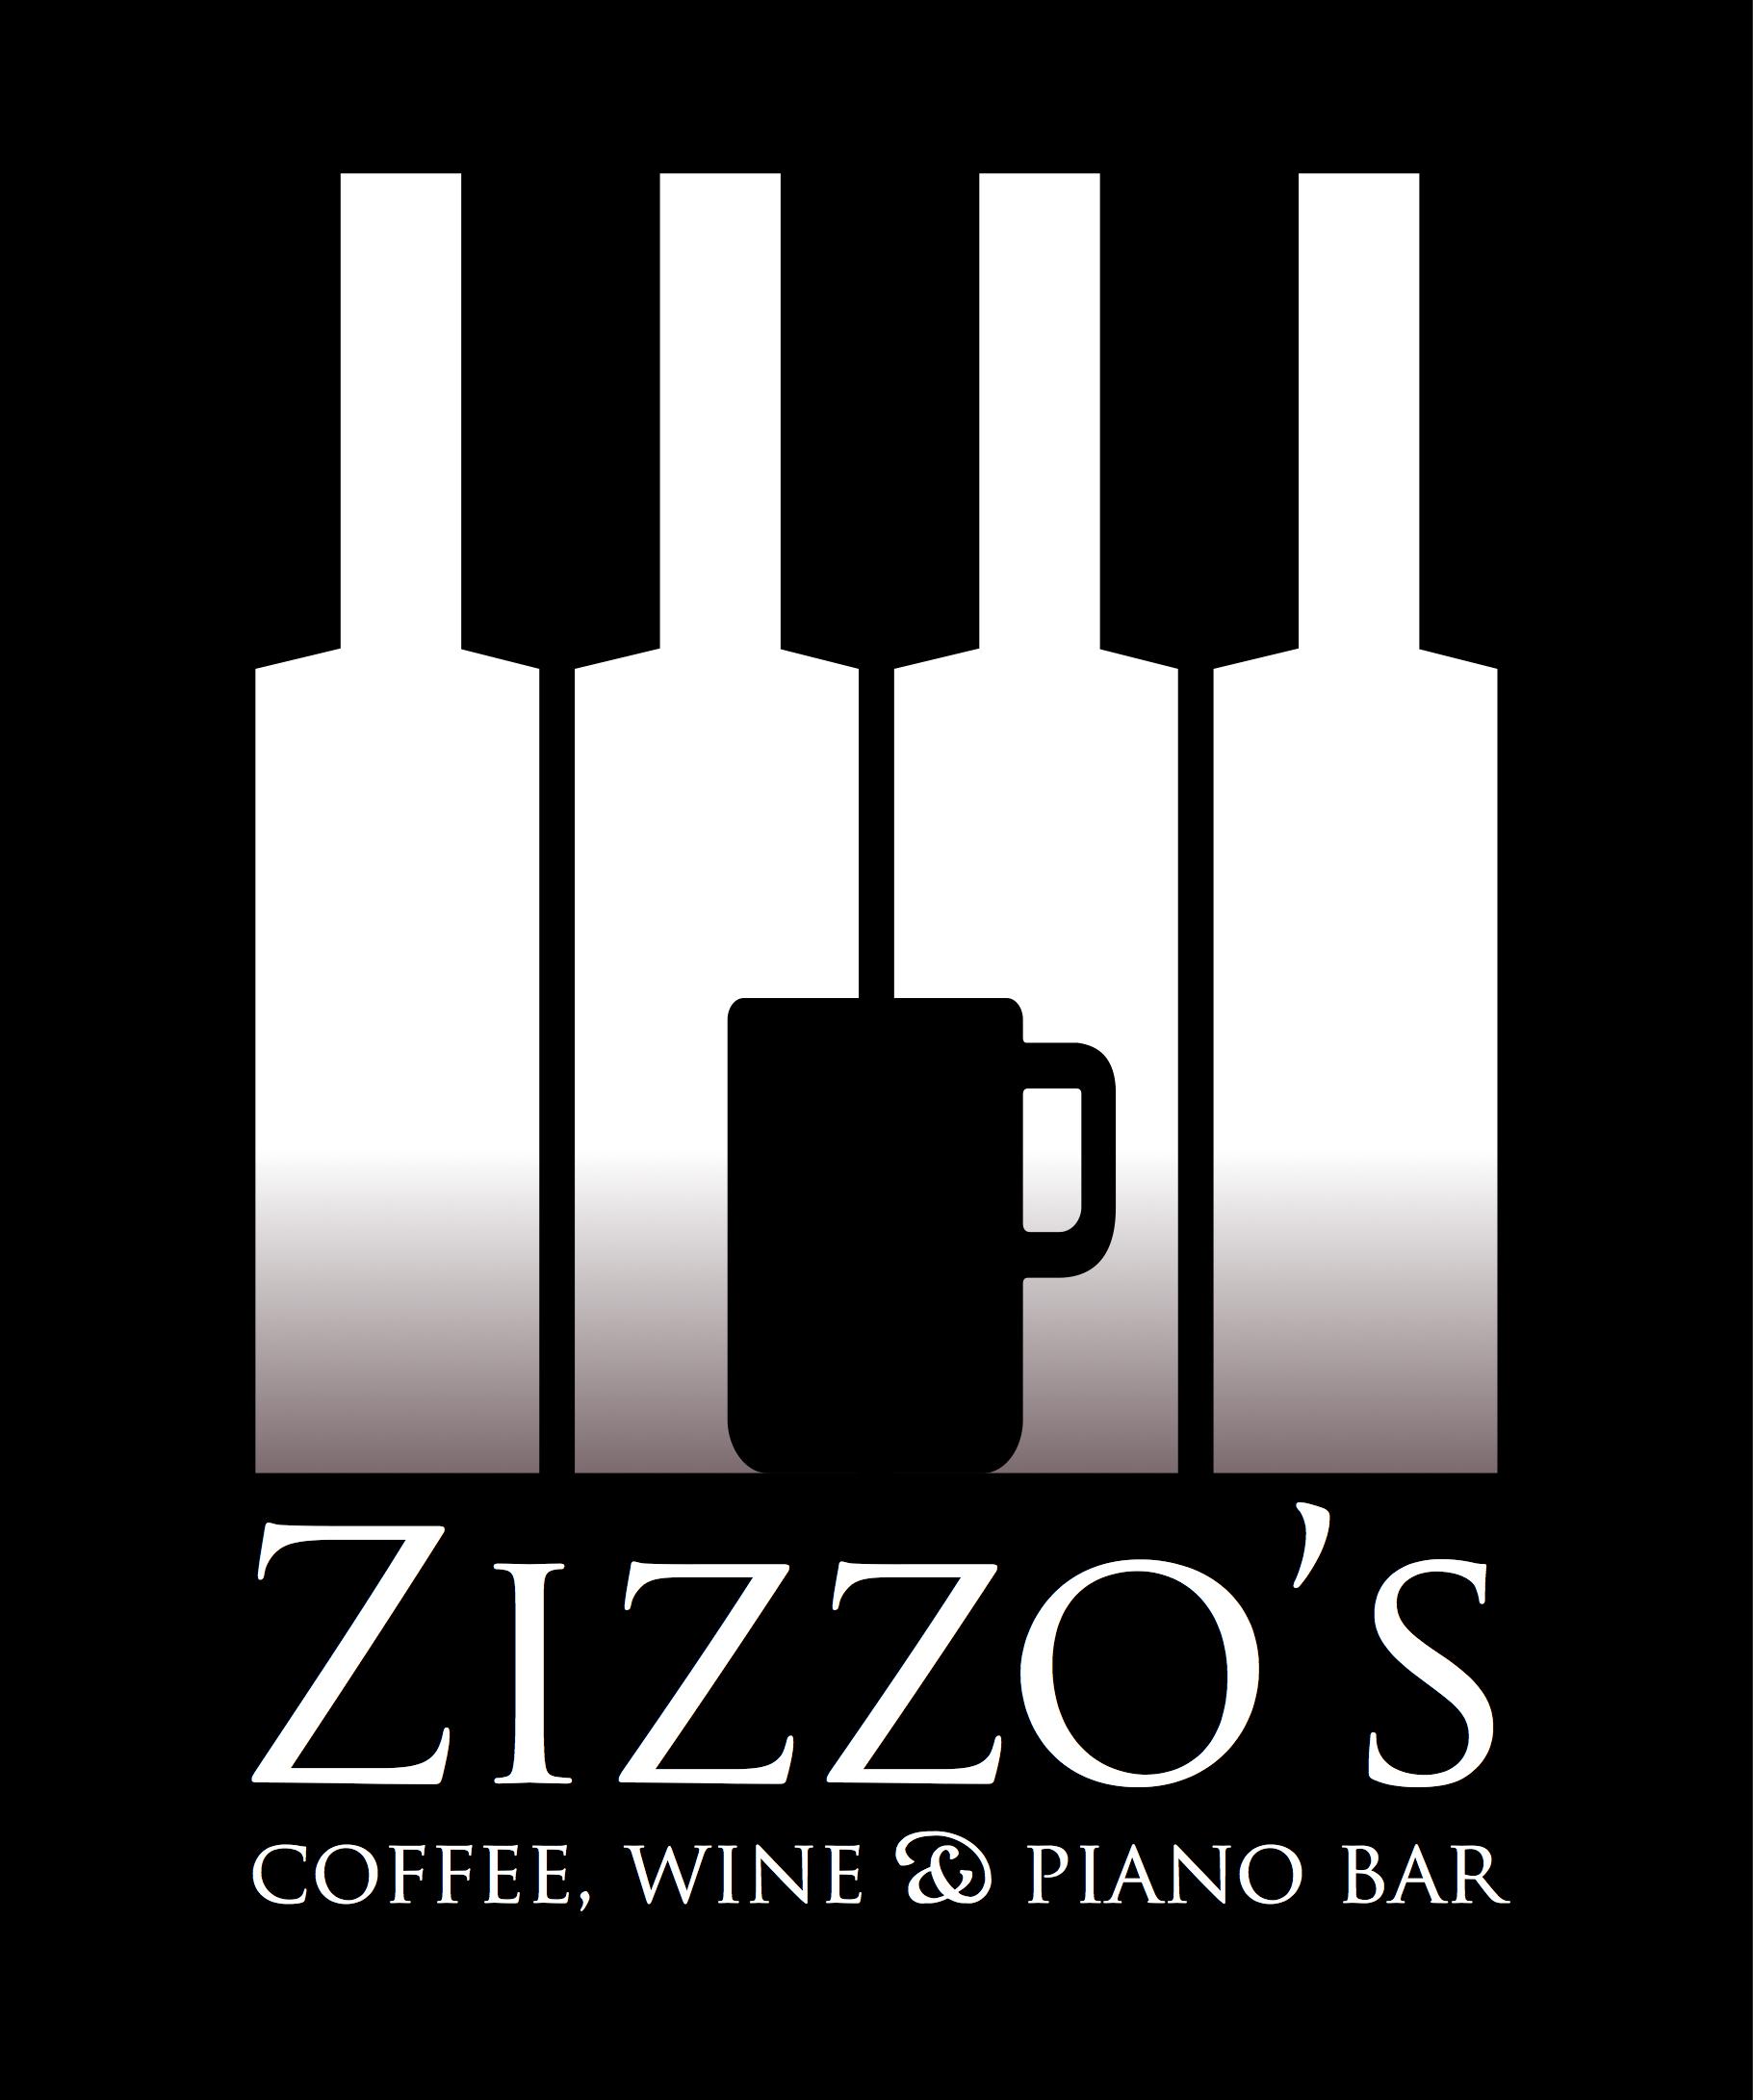 zizzo's logo